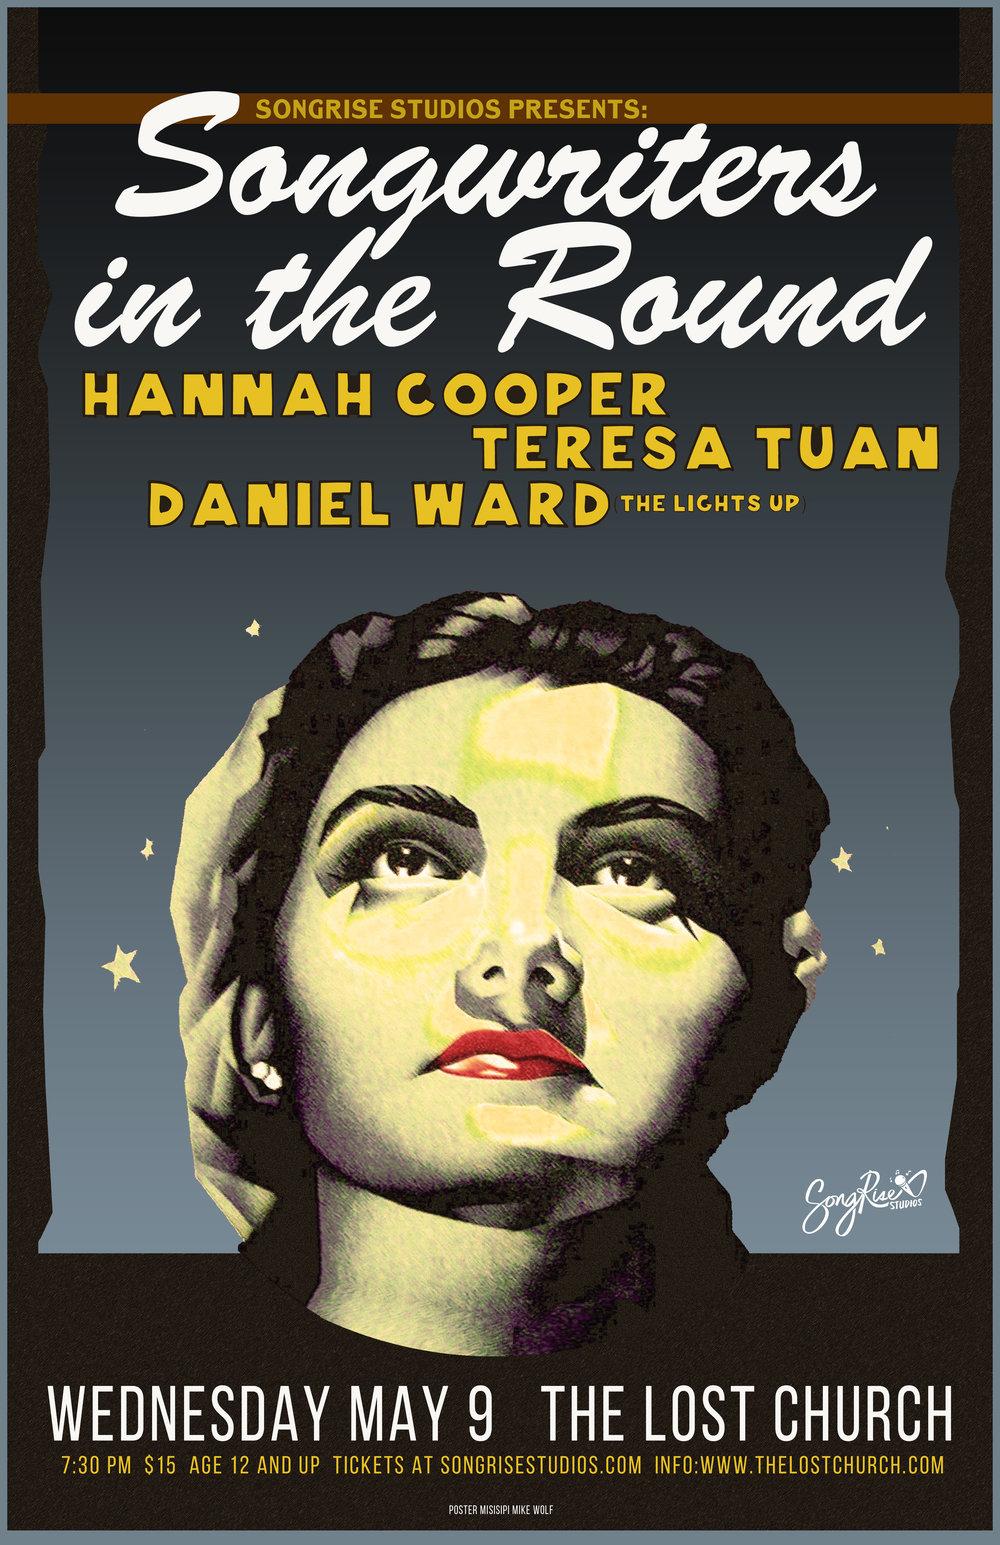 songrise studios songwrites round poster.jpg